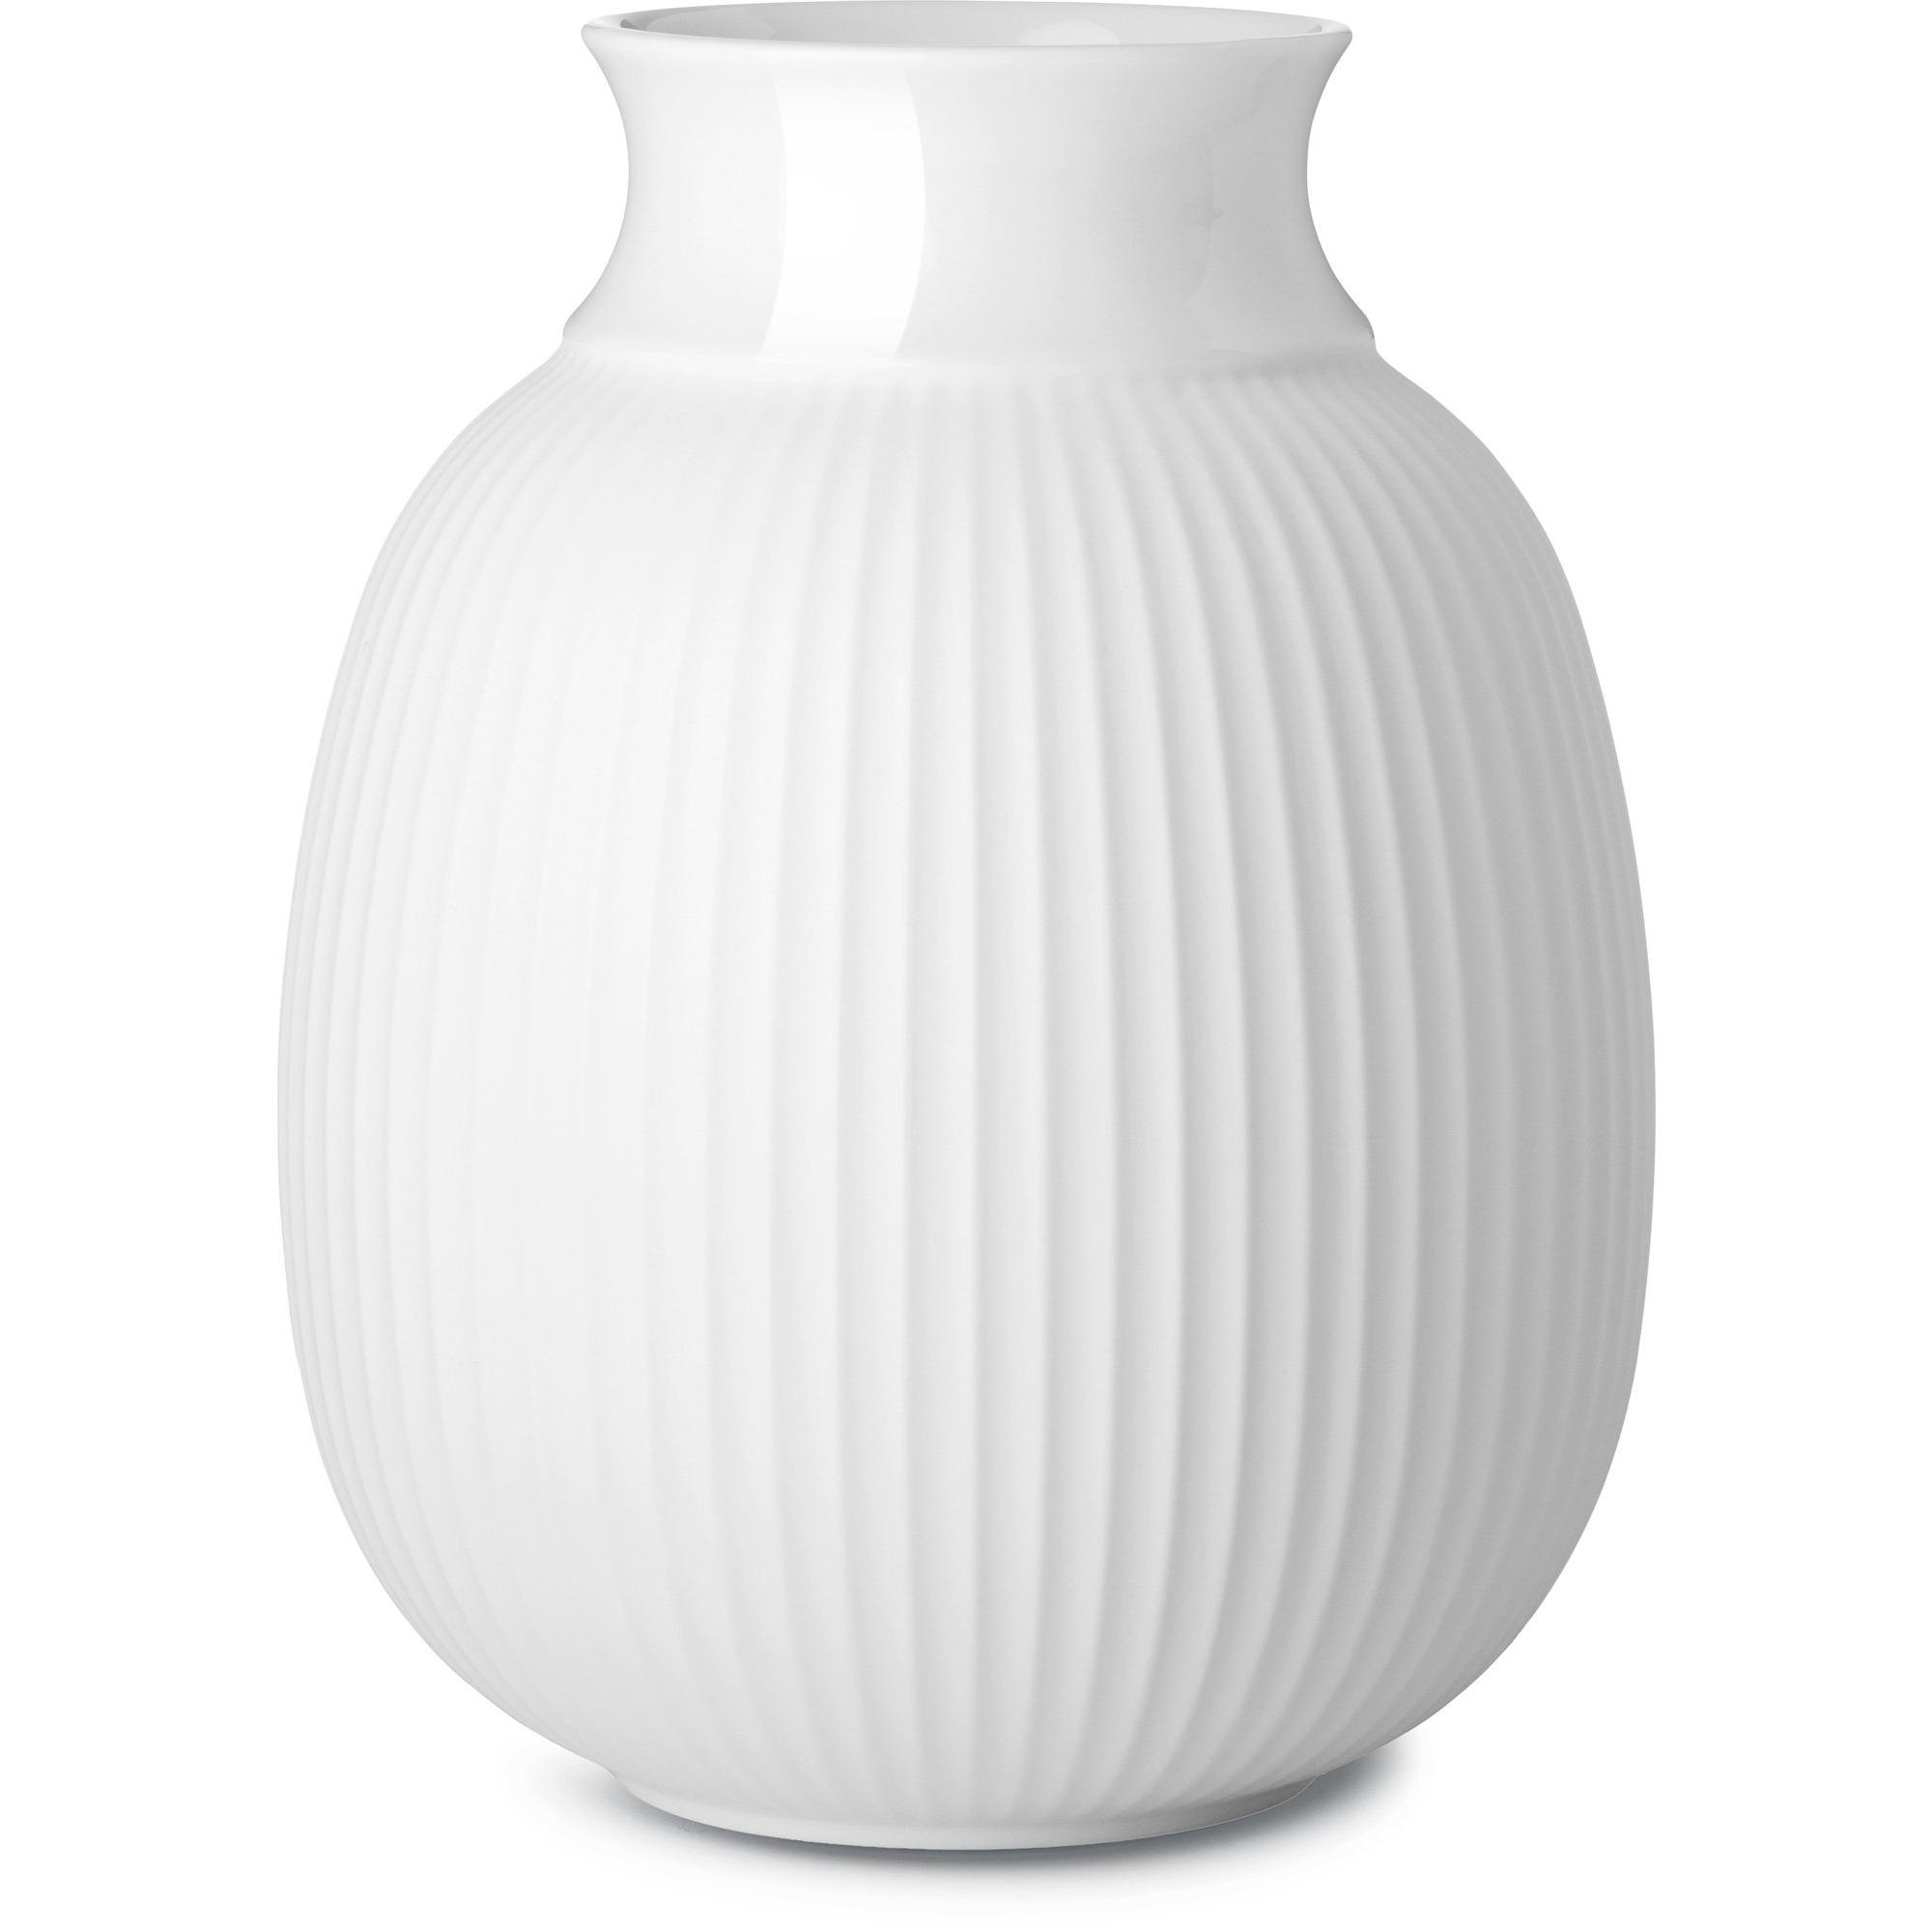 Lyngby Porcelæn Curve Vase H17 vit handgjort porslin